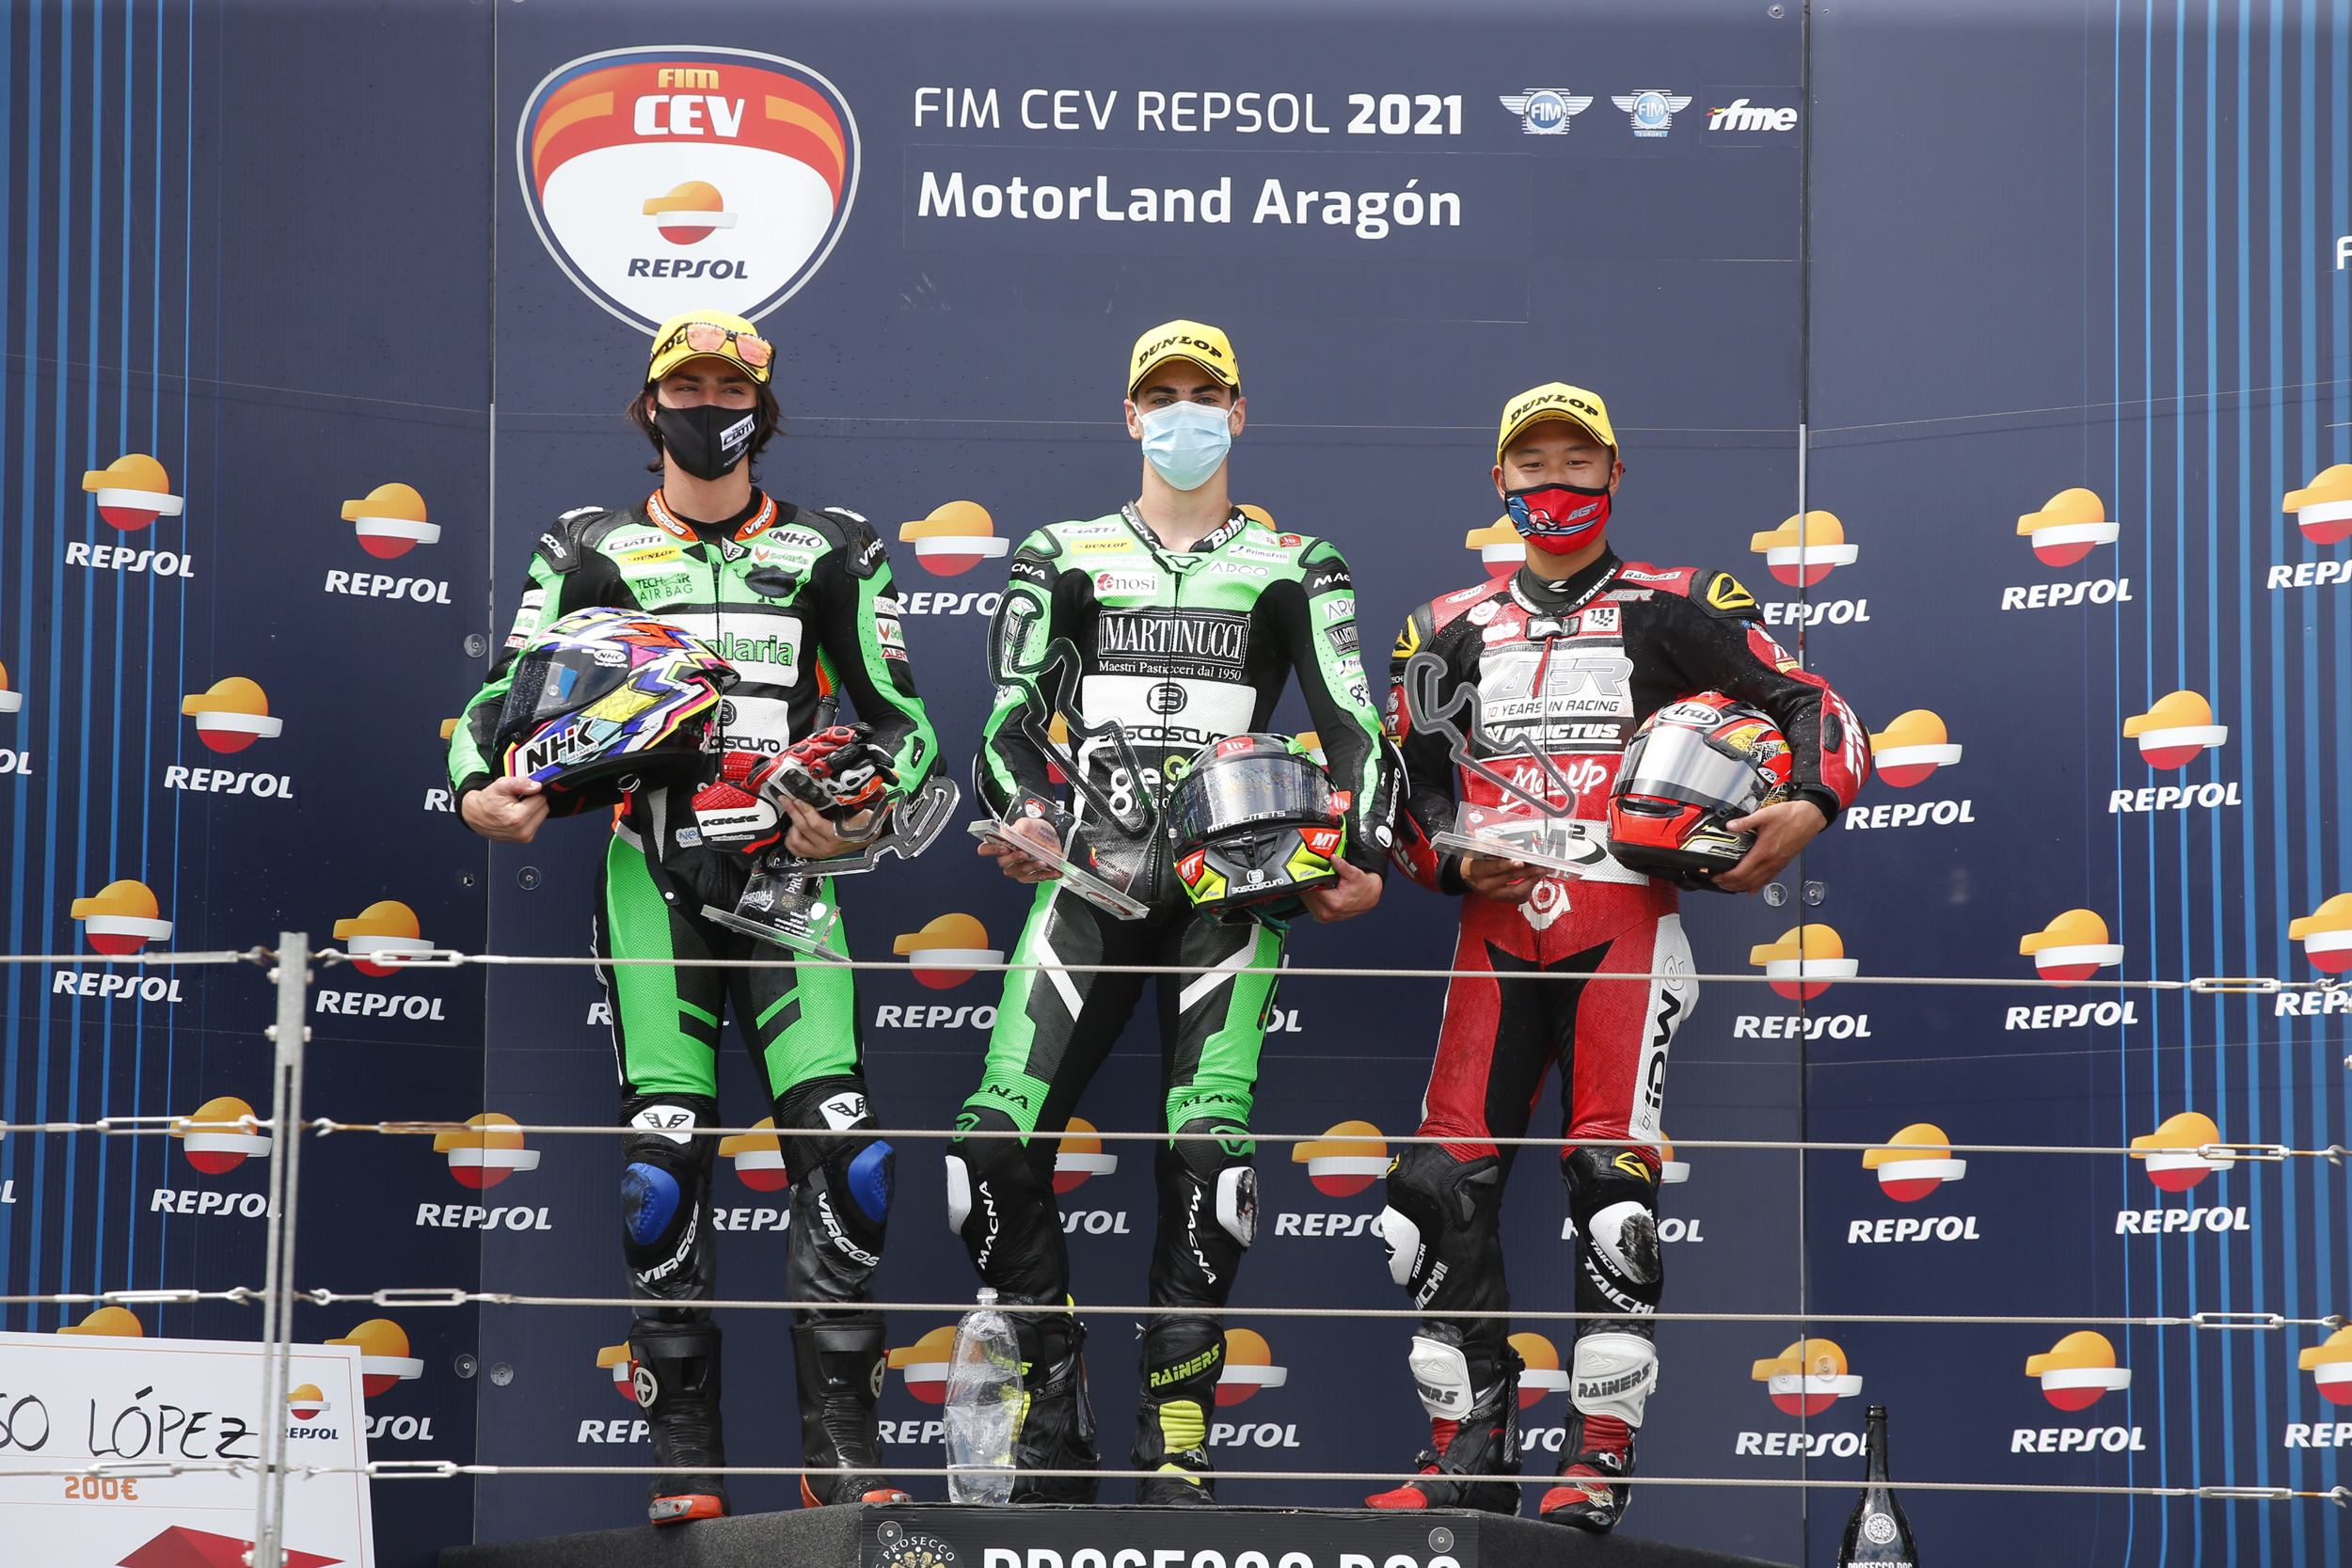 Podio Moto2 FIM CEV Repsol - Fermín Aldeguer, Alonso López, Taiga Hada